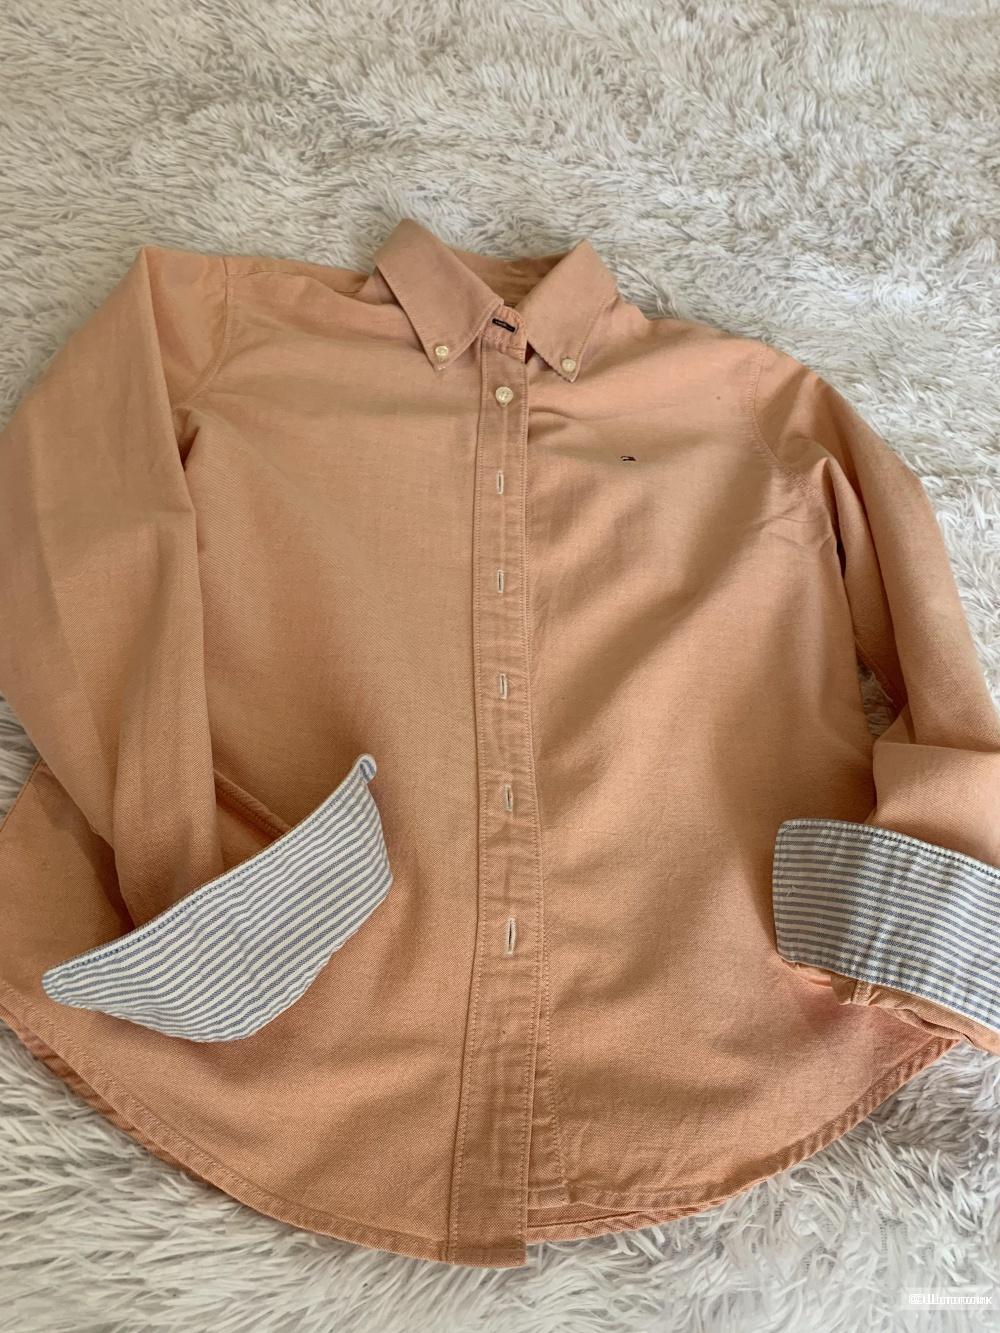 Рубашка Tommy Hilfiger, S/M